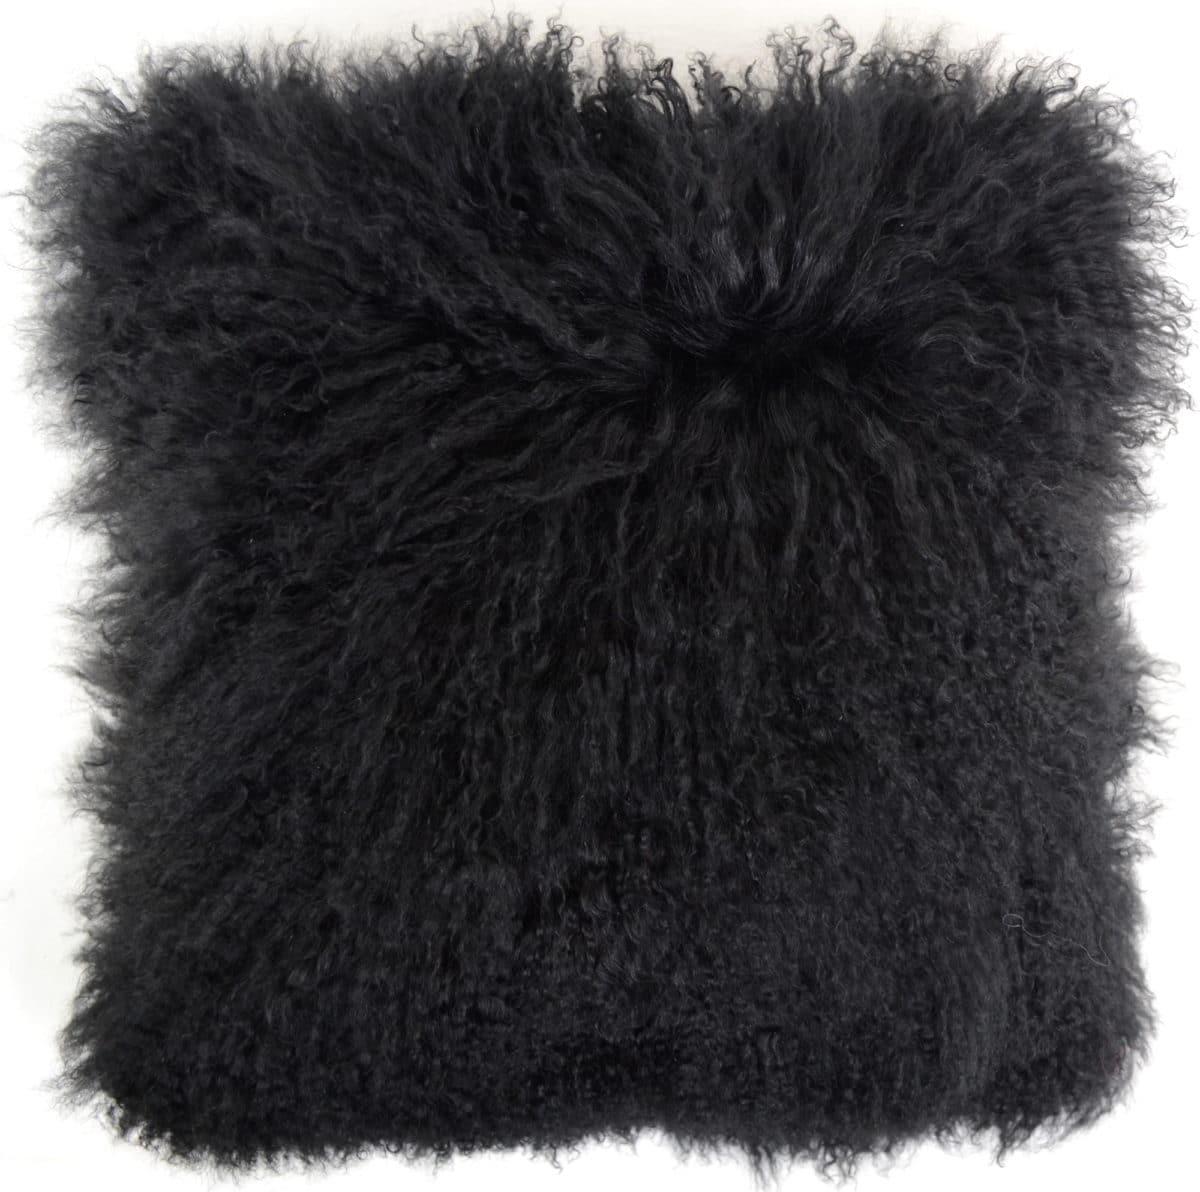 Snugrugs Mongolian Sheepskin Cushion 60cm x 60cm – Black